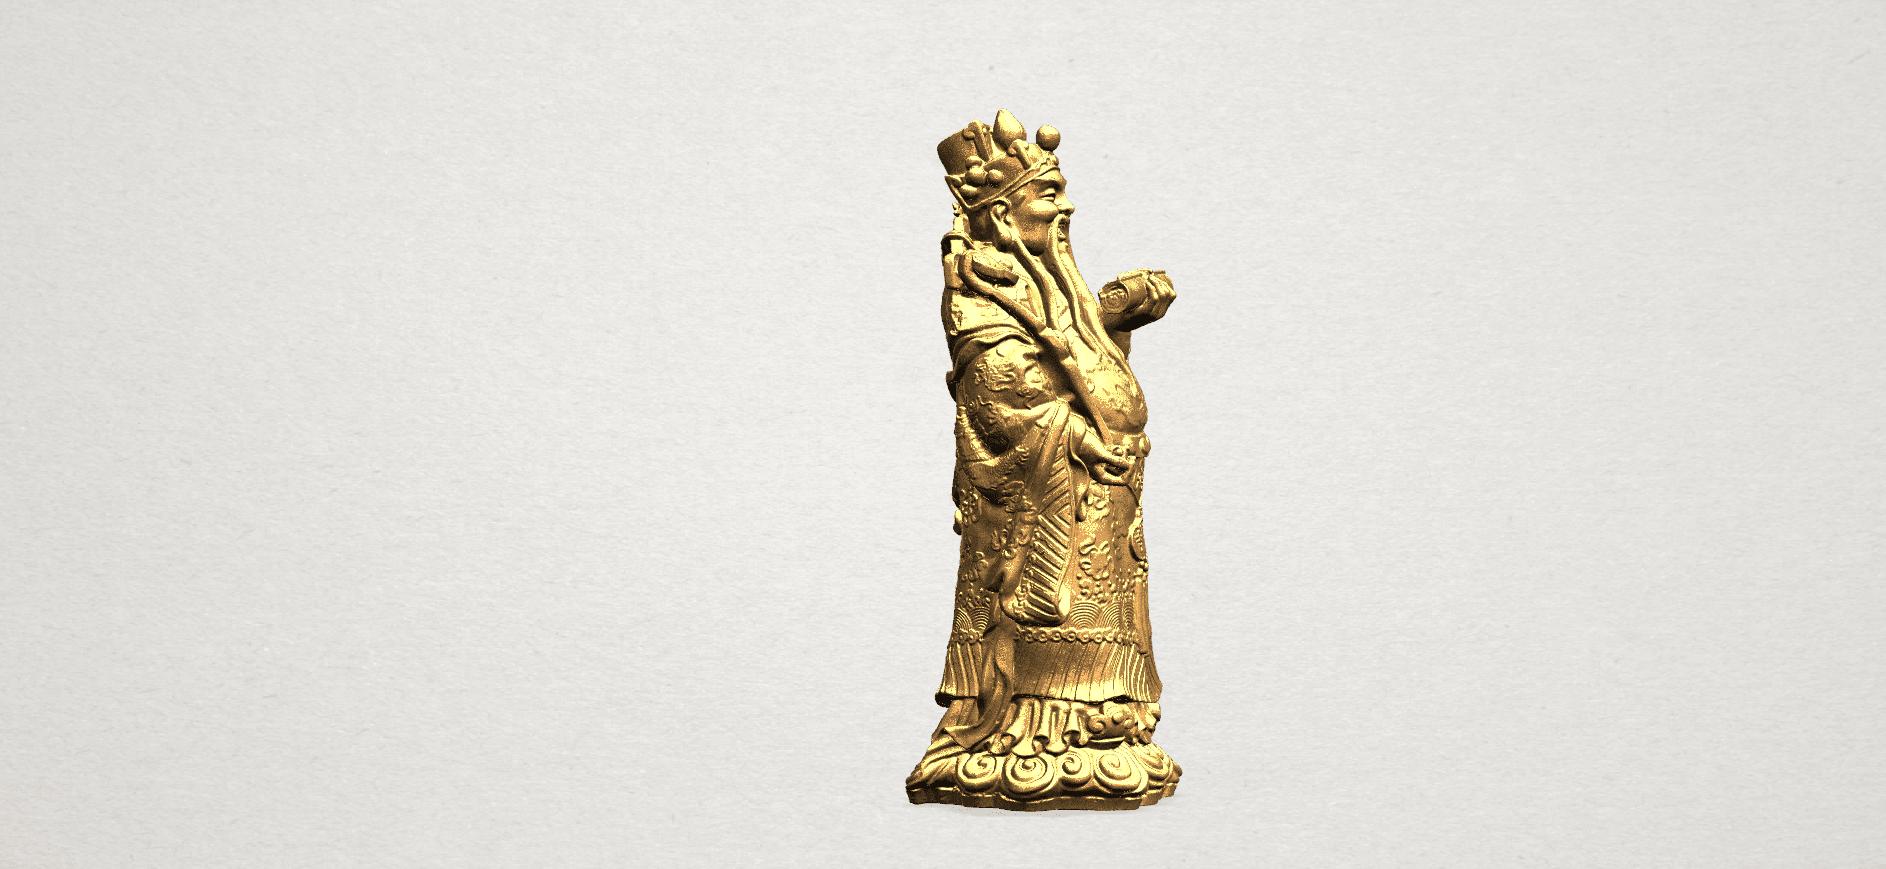 God of Treasure - B10.png Download free STL file God of Treasure • 3D printing model, GeorgesNikkei